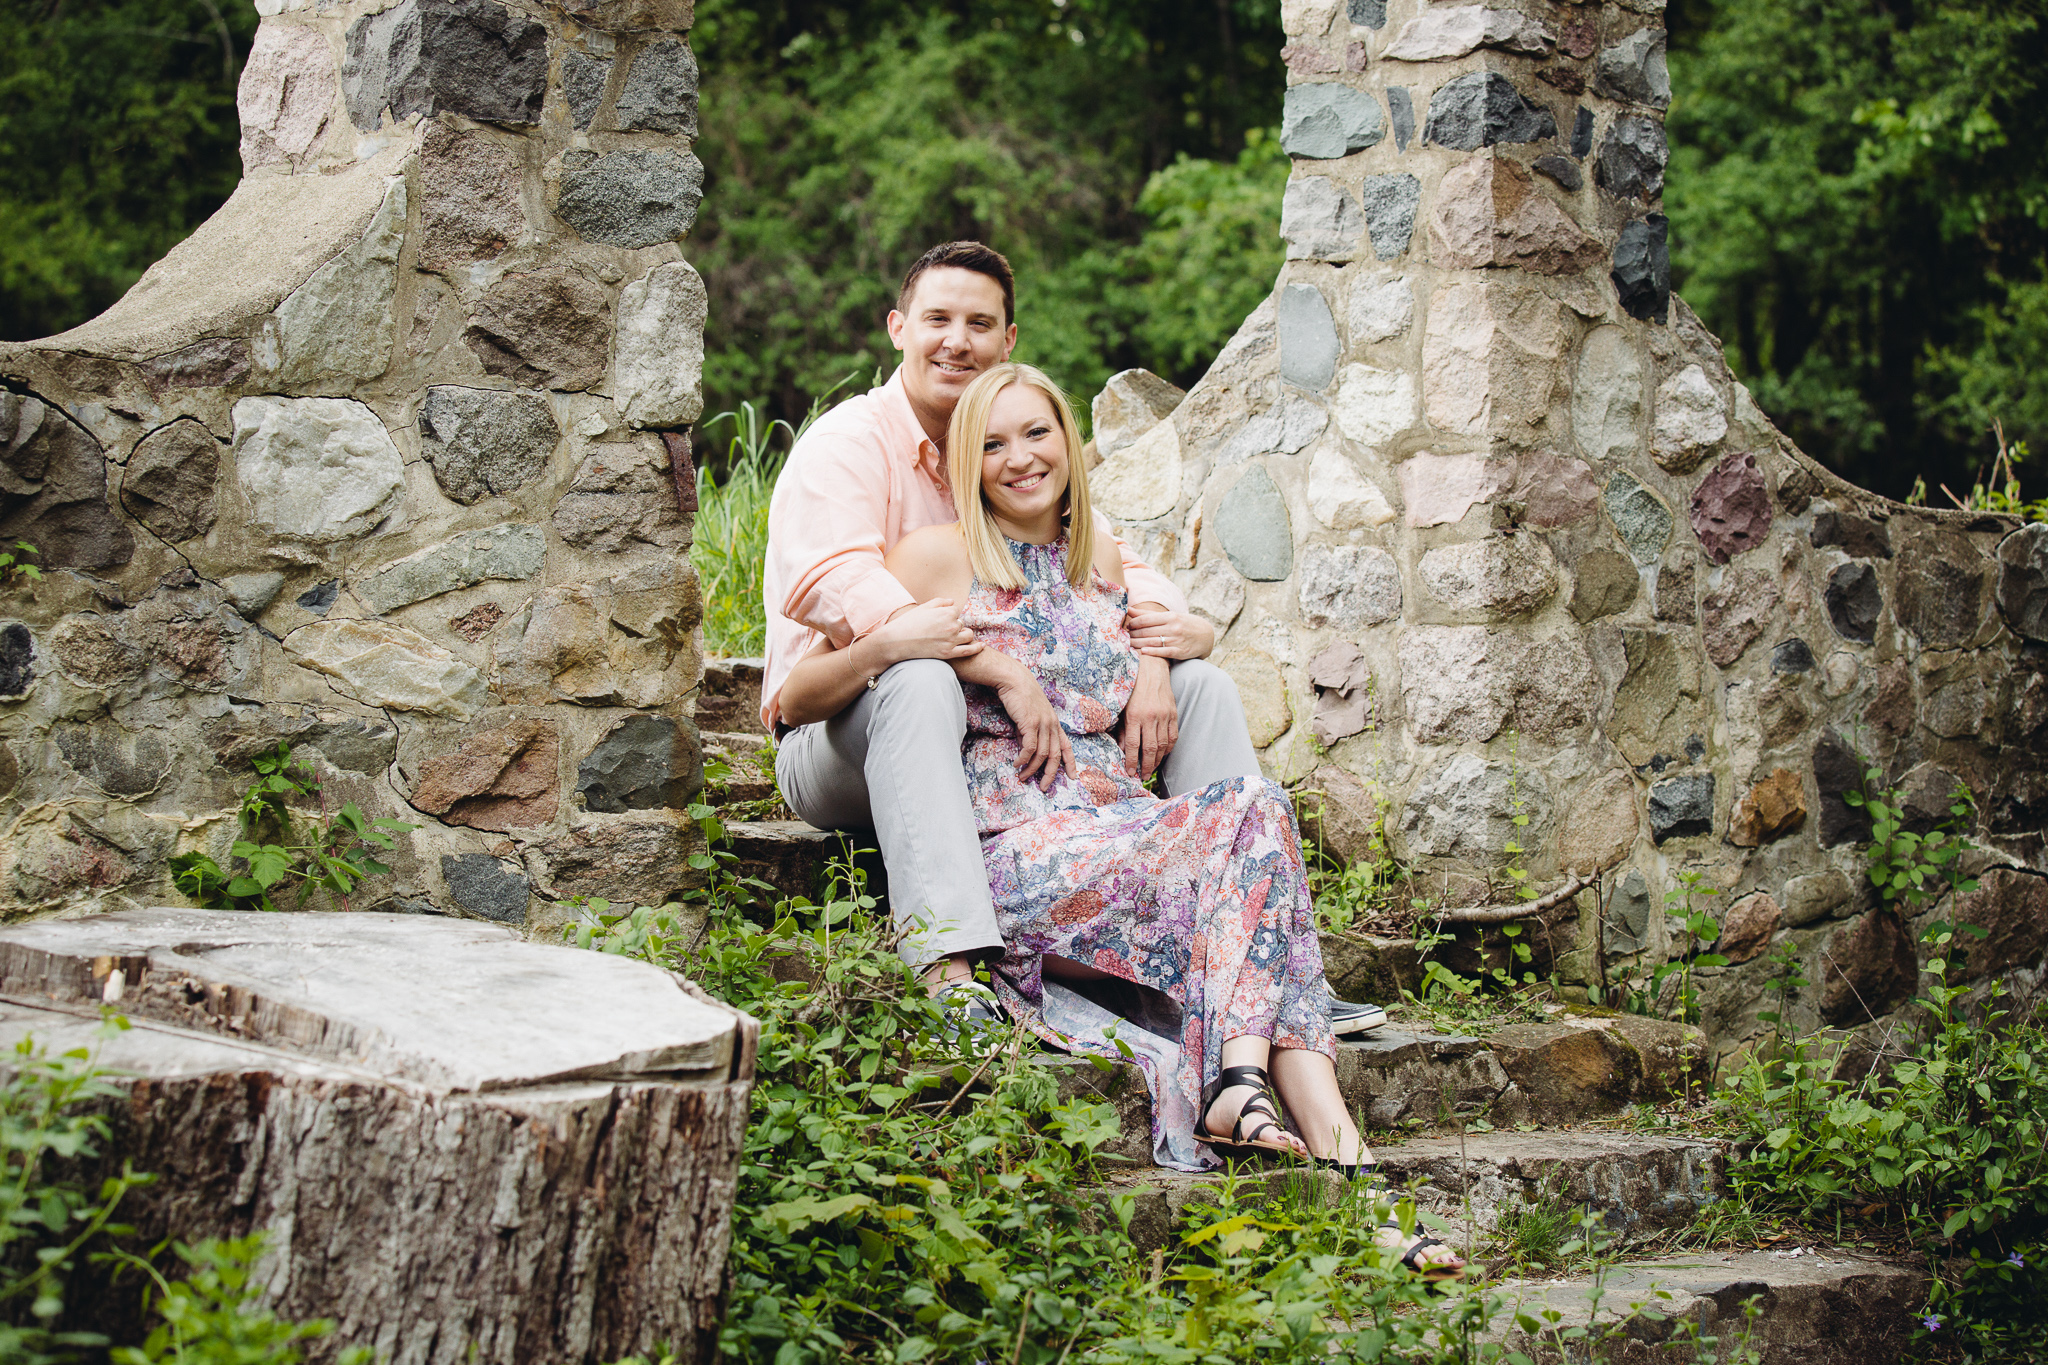 Laura Amp Joe Engagement At Stoney Creek Metro Park Shelby Twp MI Blend Photography